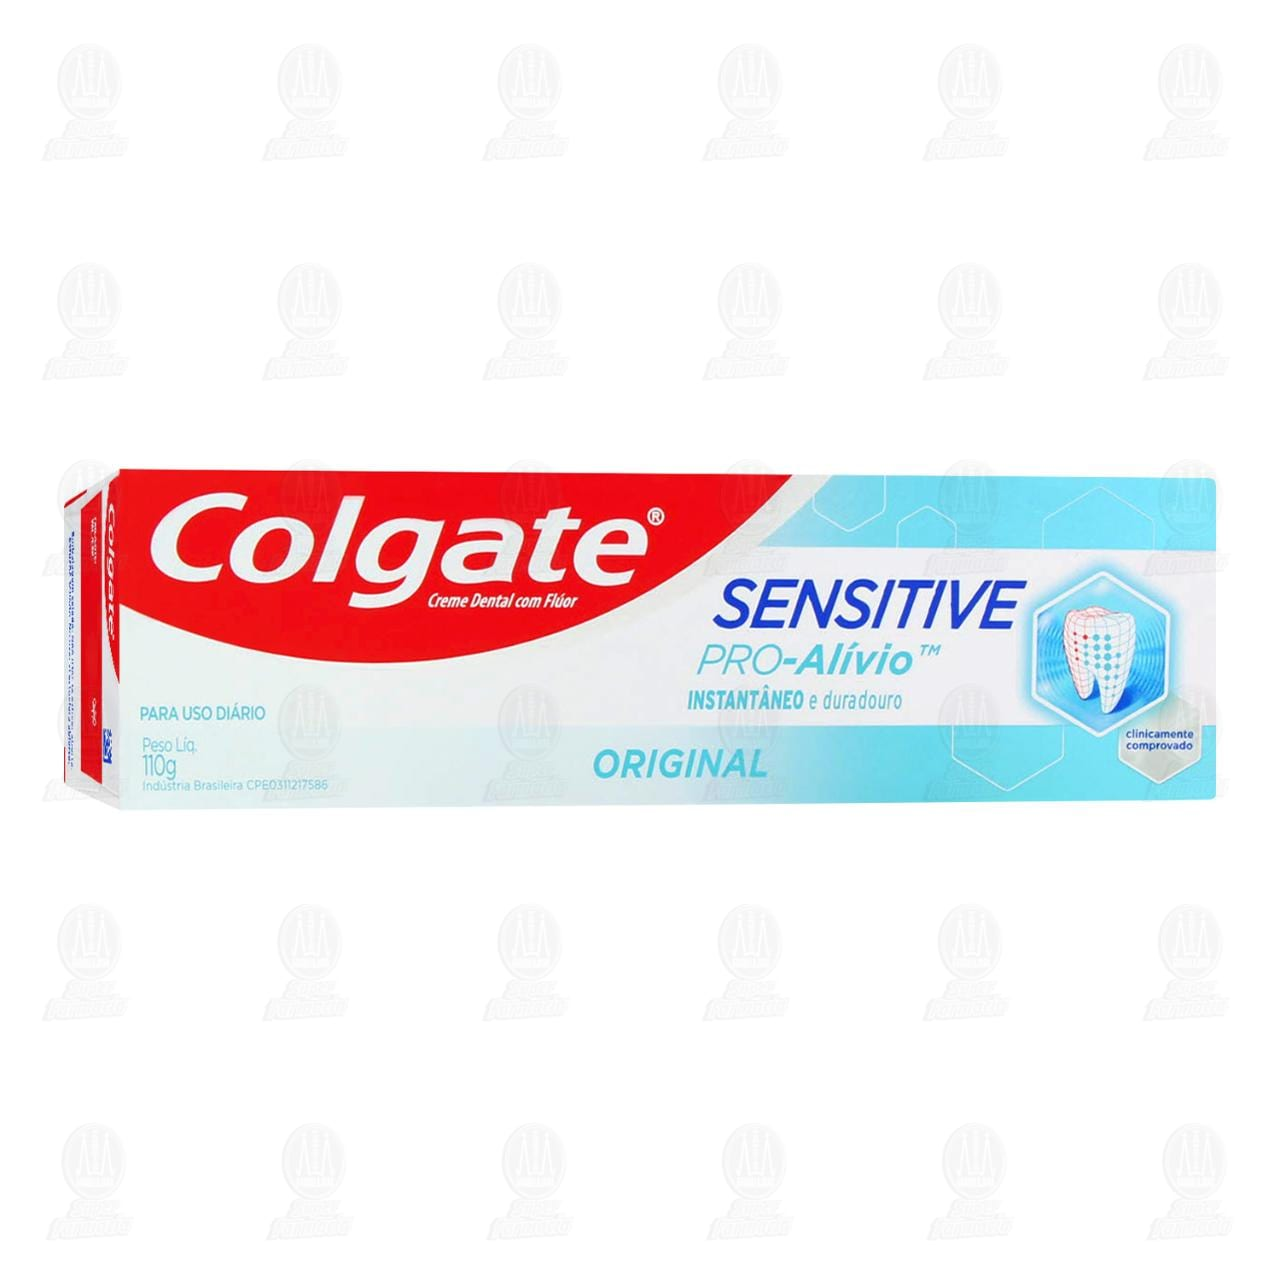 Comprar Pasta Dental Colgate Sensitive Pro-Alivio Original, 75 ml. en Farmacias Guadalajara